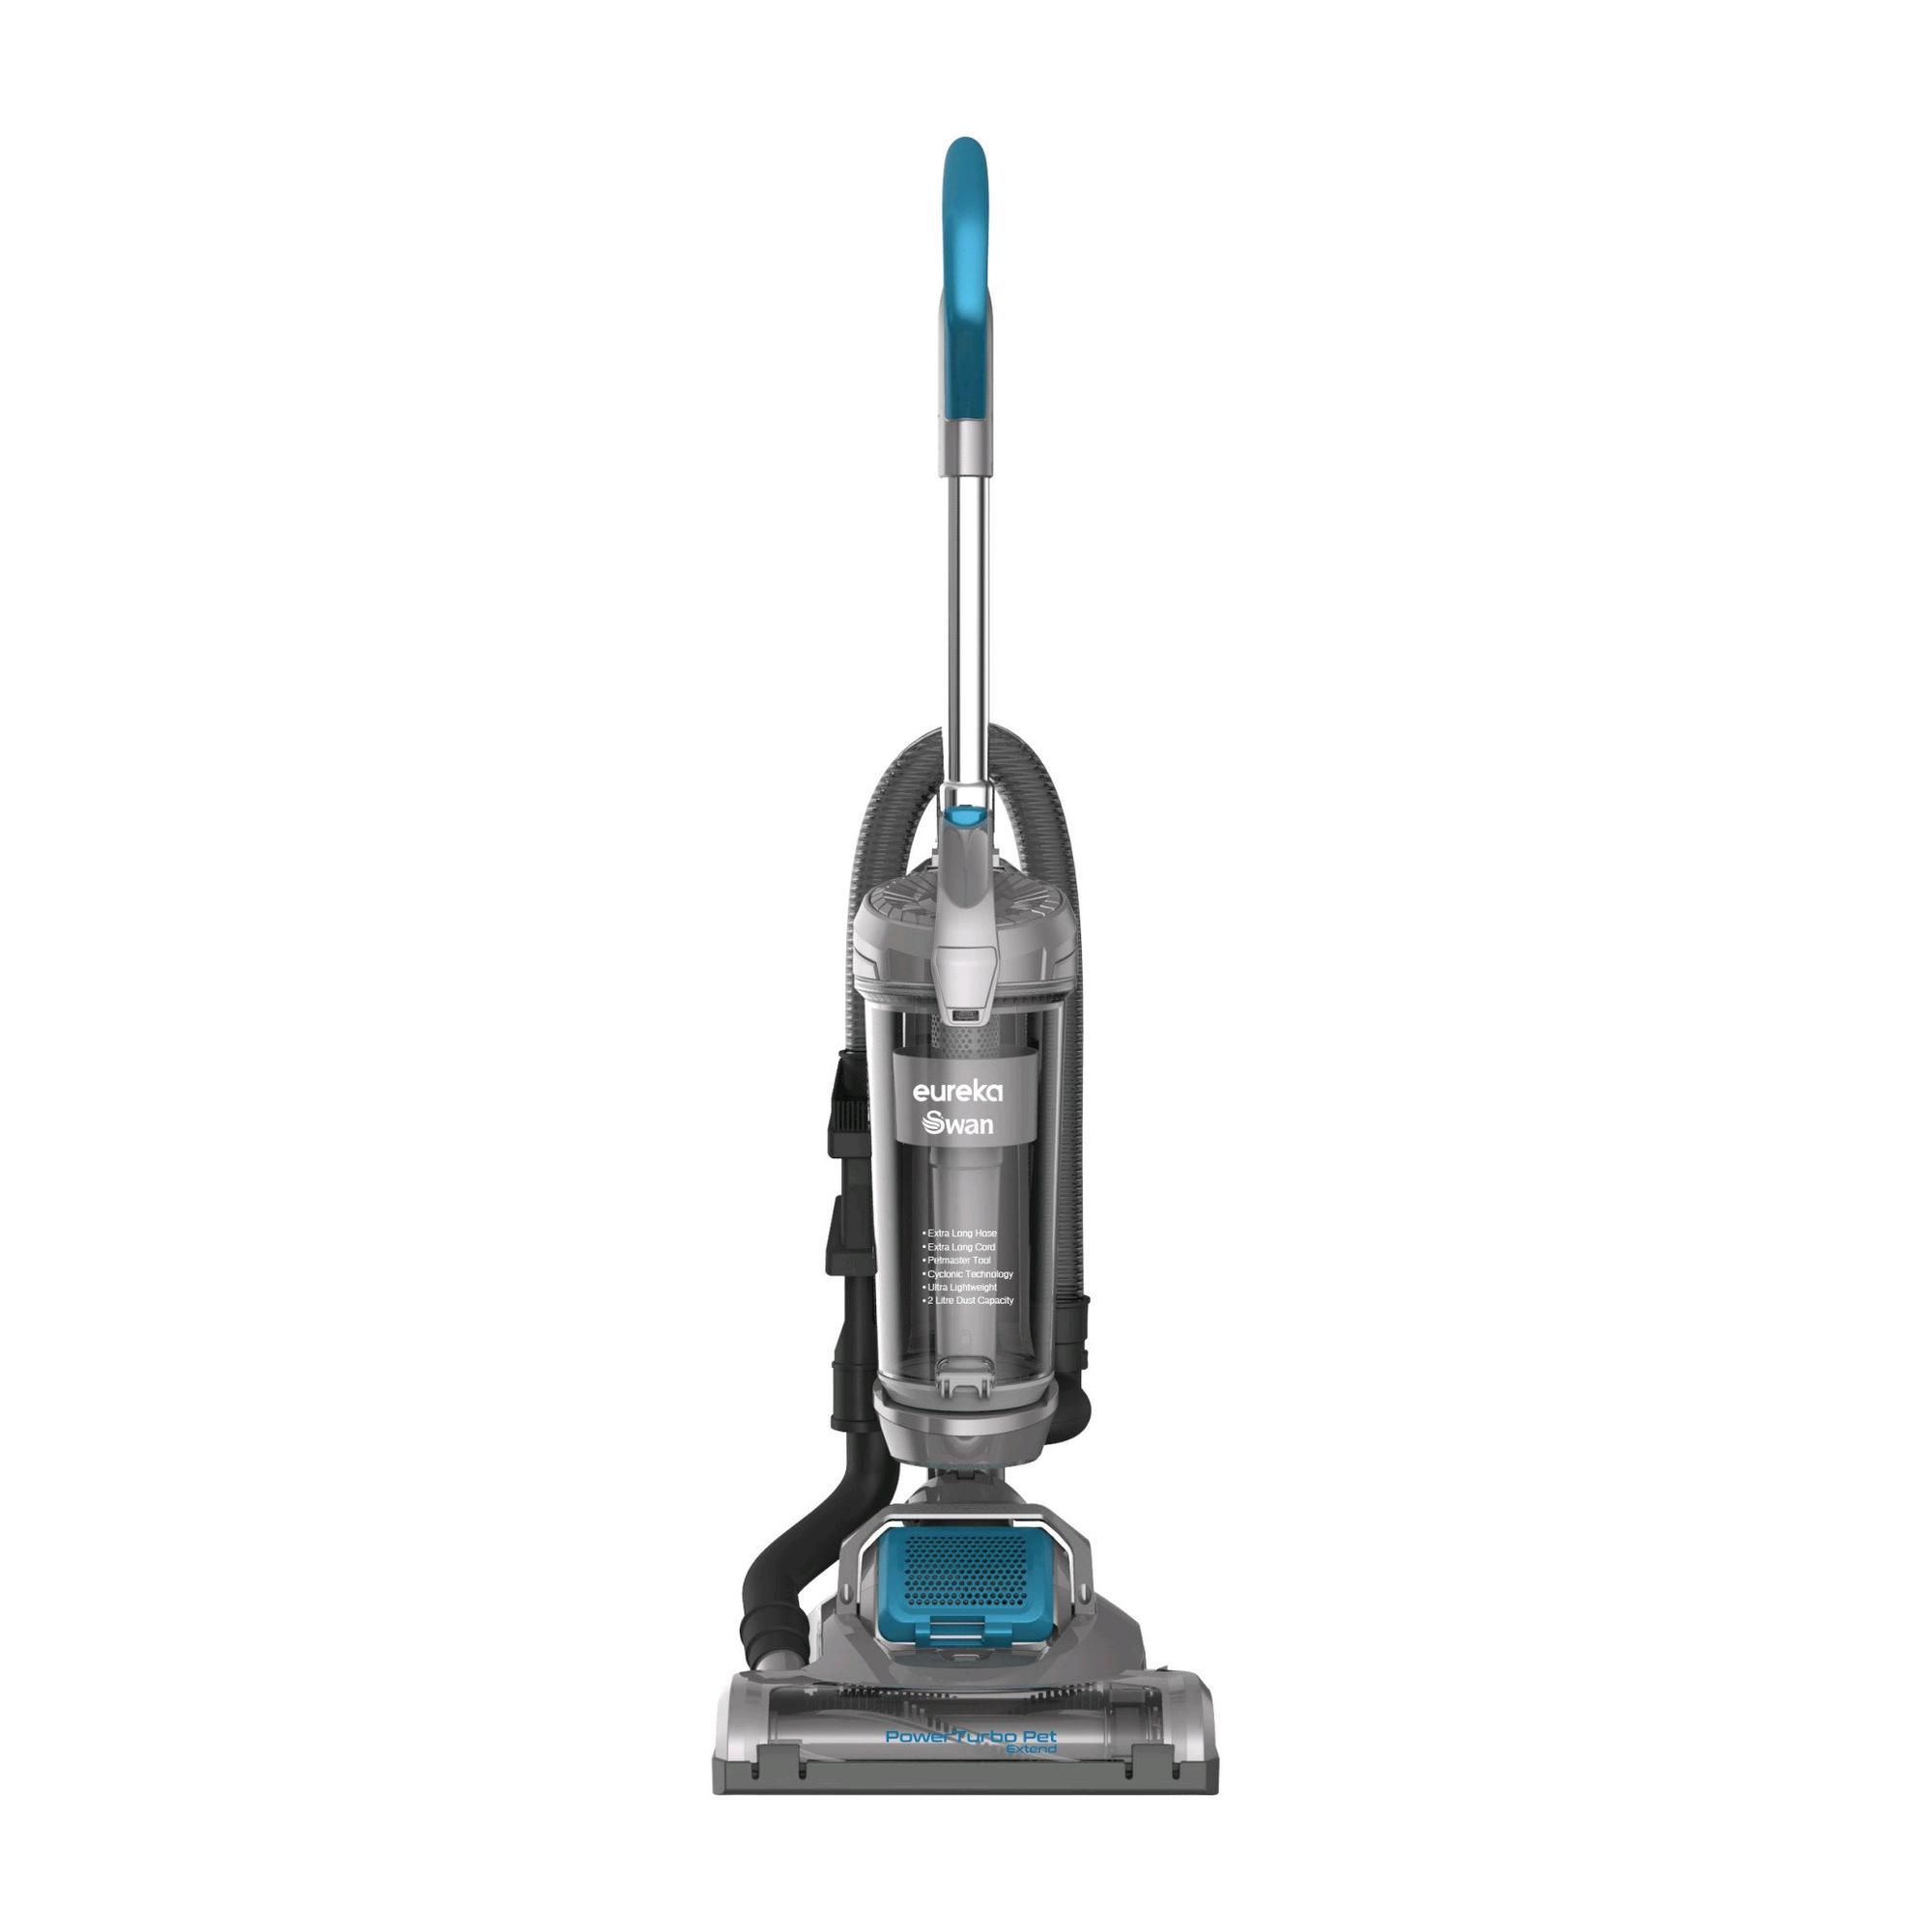 Swan Eureka Power Turbo Pet Extended Upright Vacuum